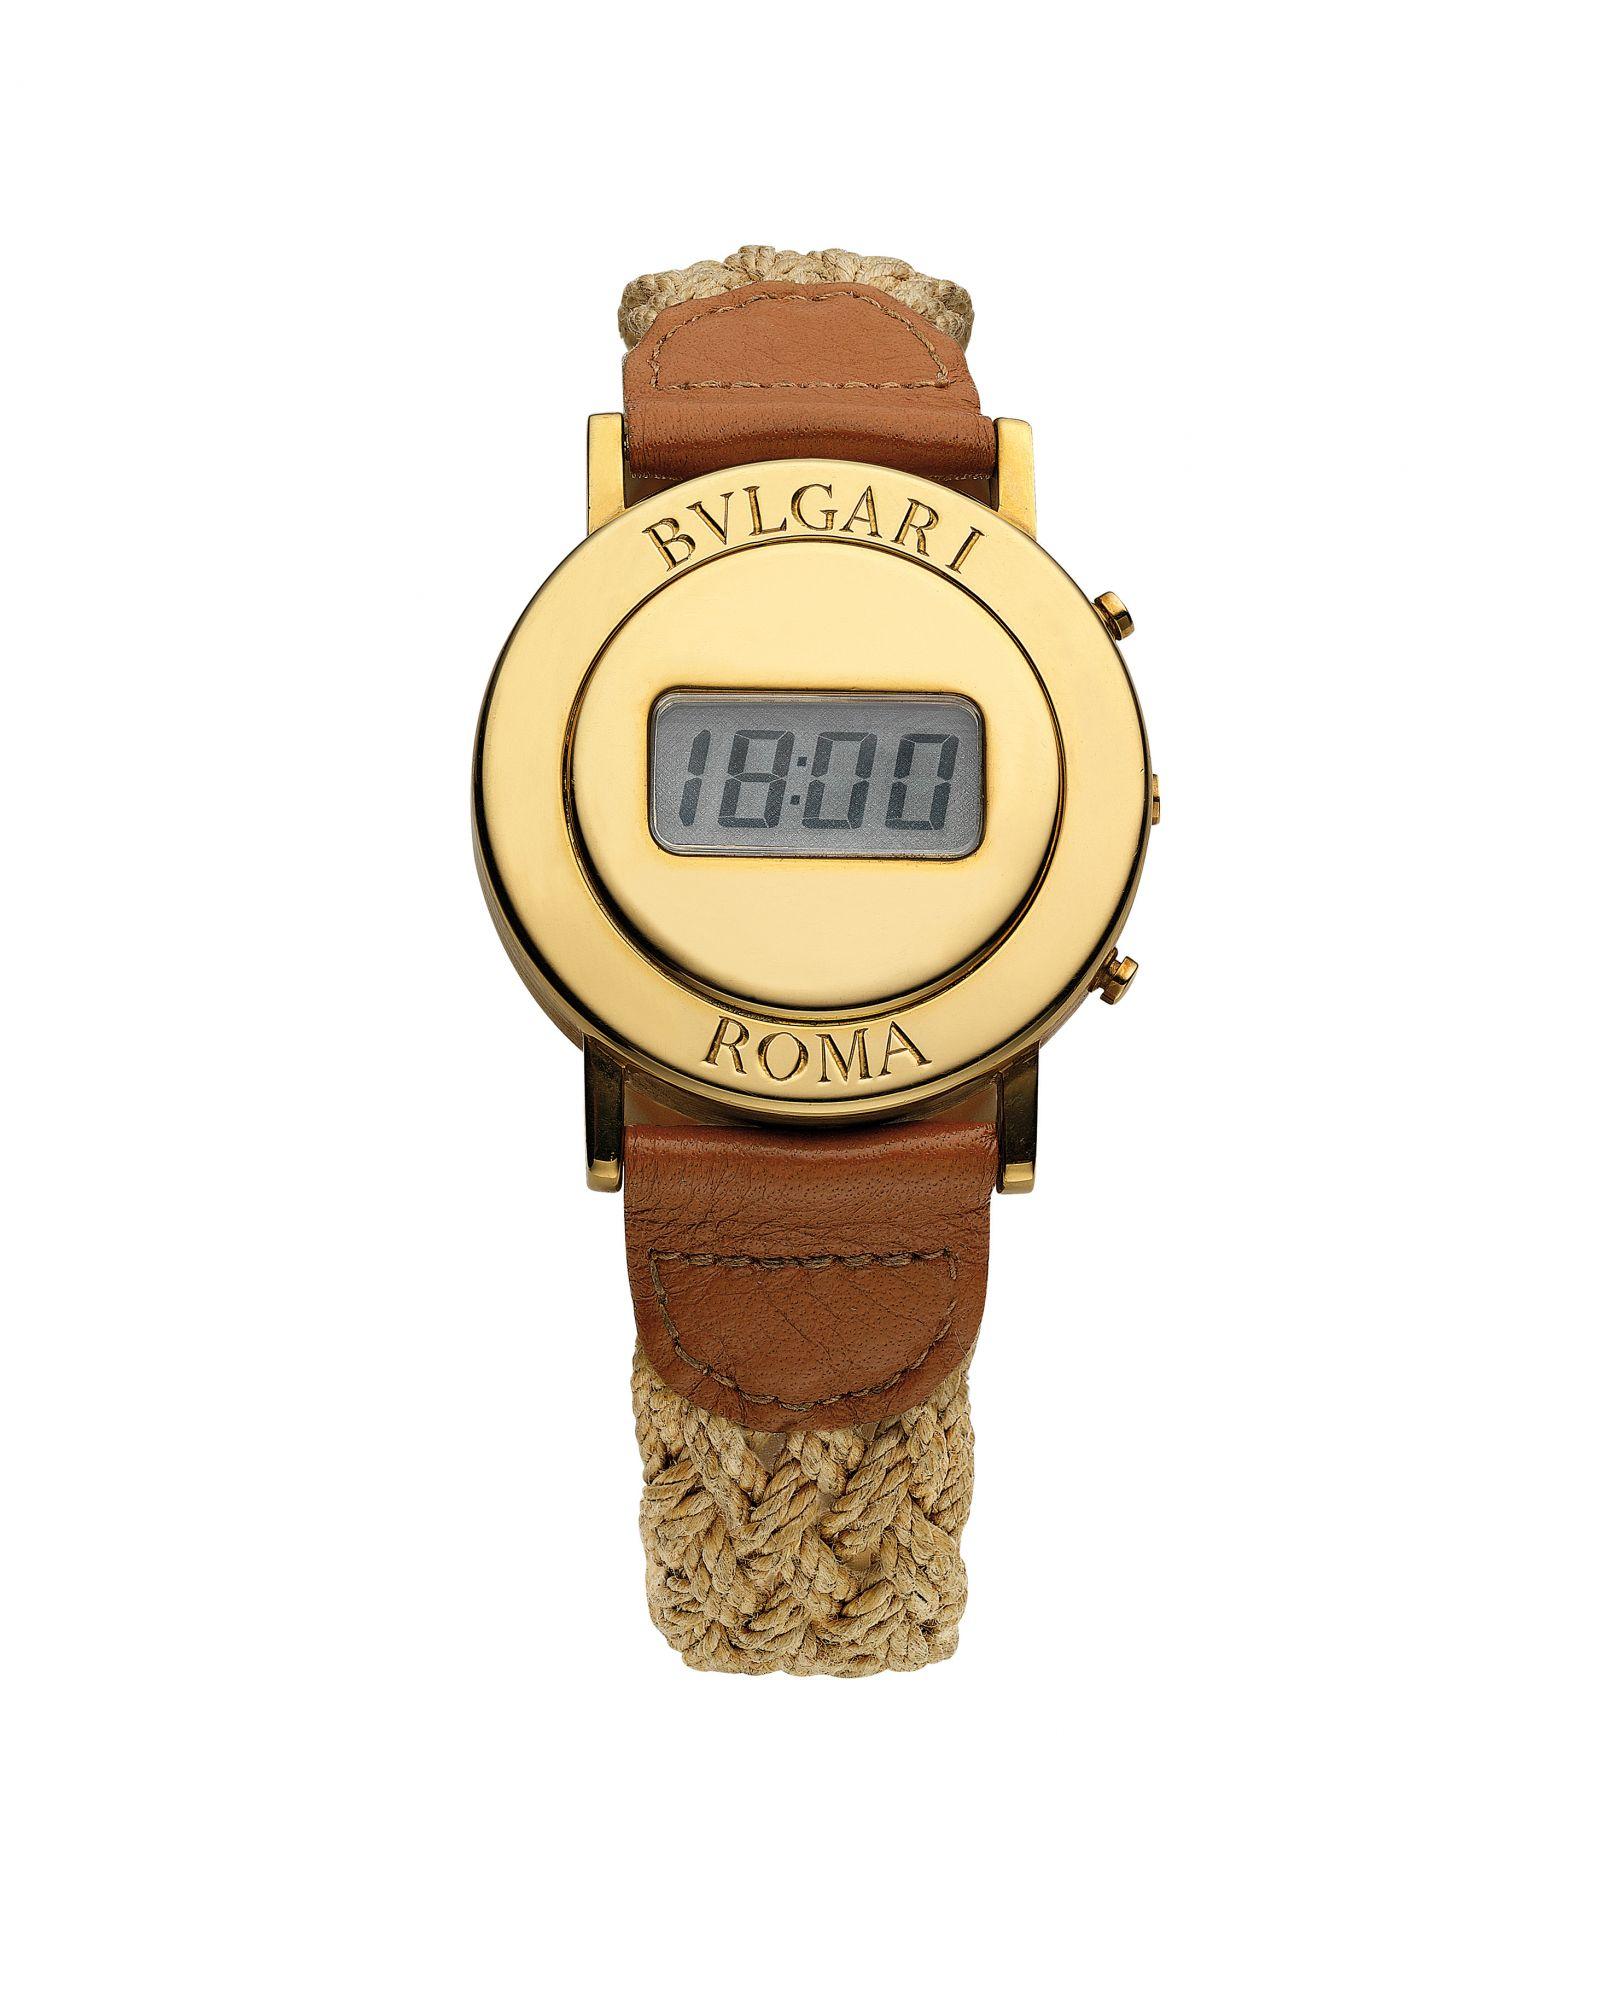 Bulgari於1975年打造,為了贈送給貴賓的圓形Bulgari Roma電子腕錶。